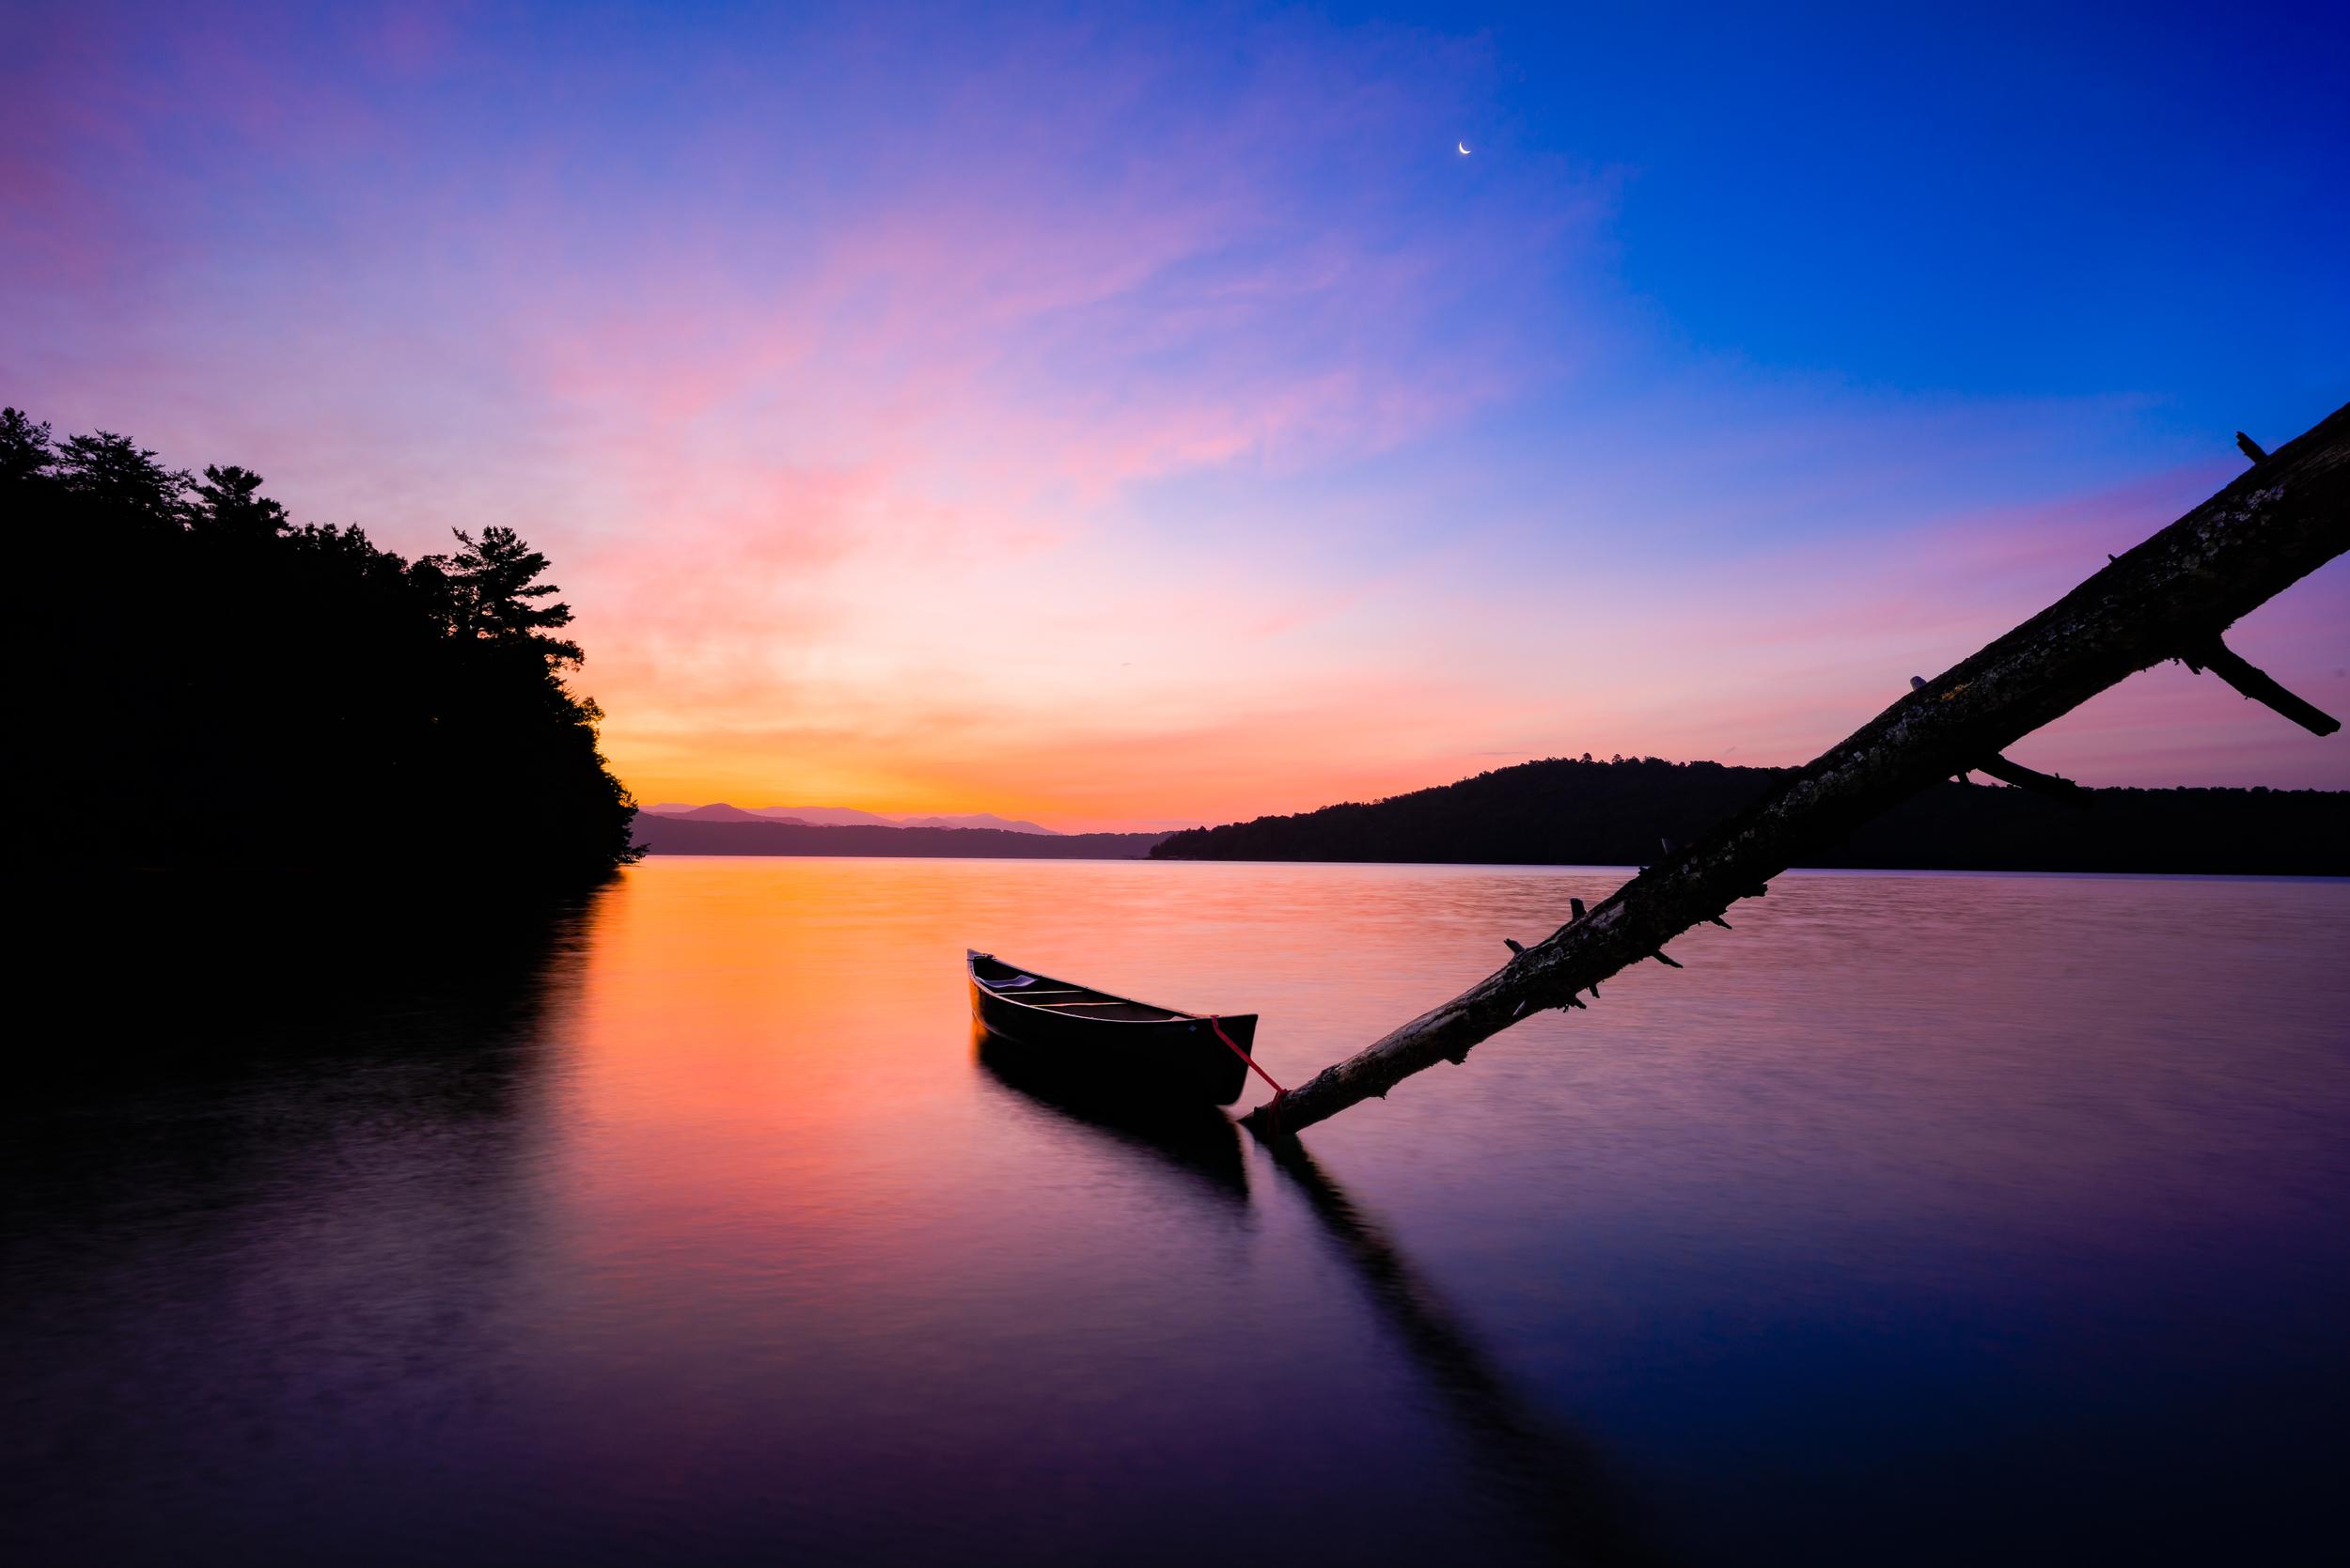 canoe-1000.jpg